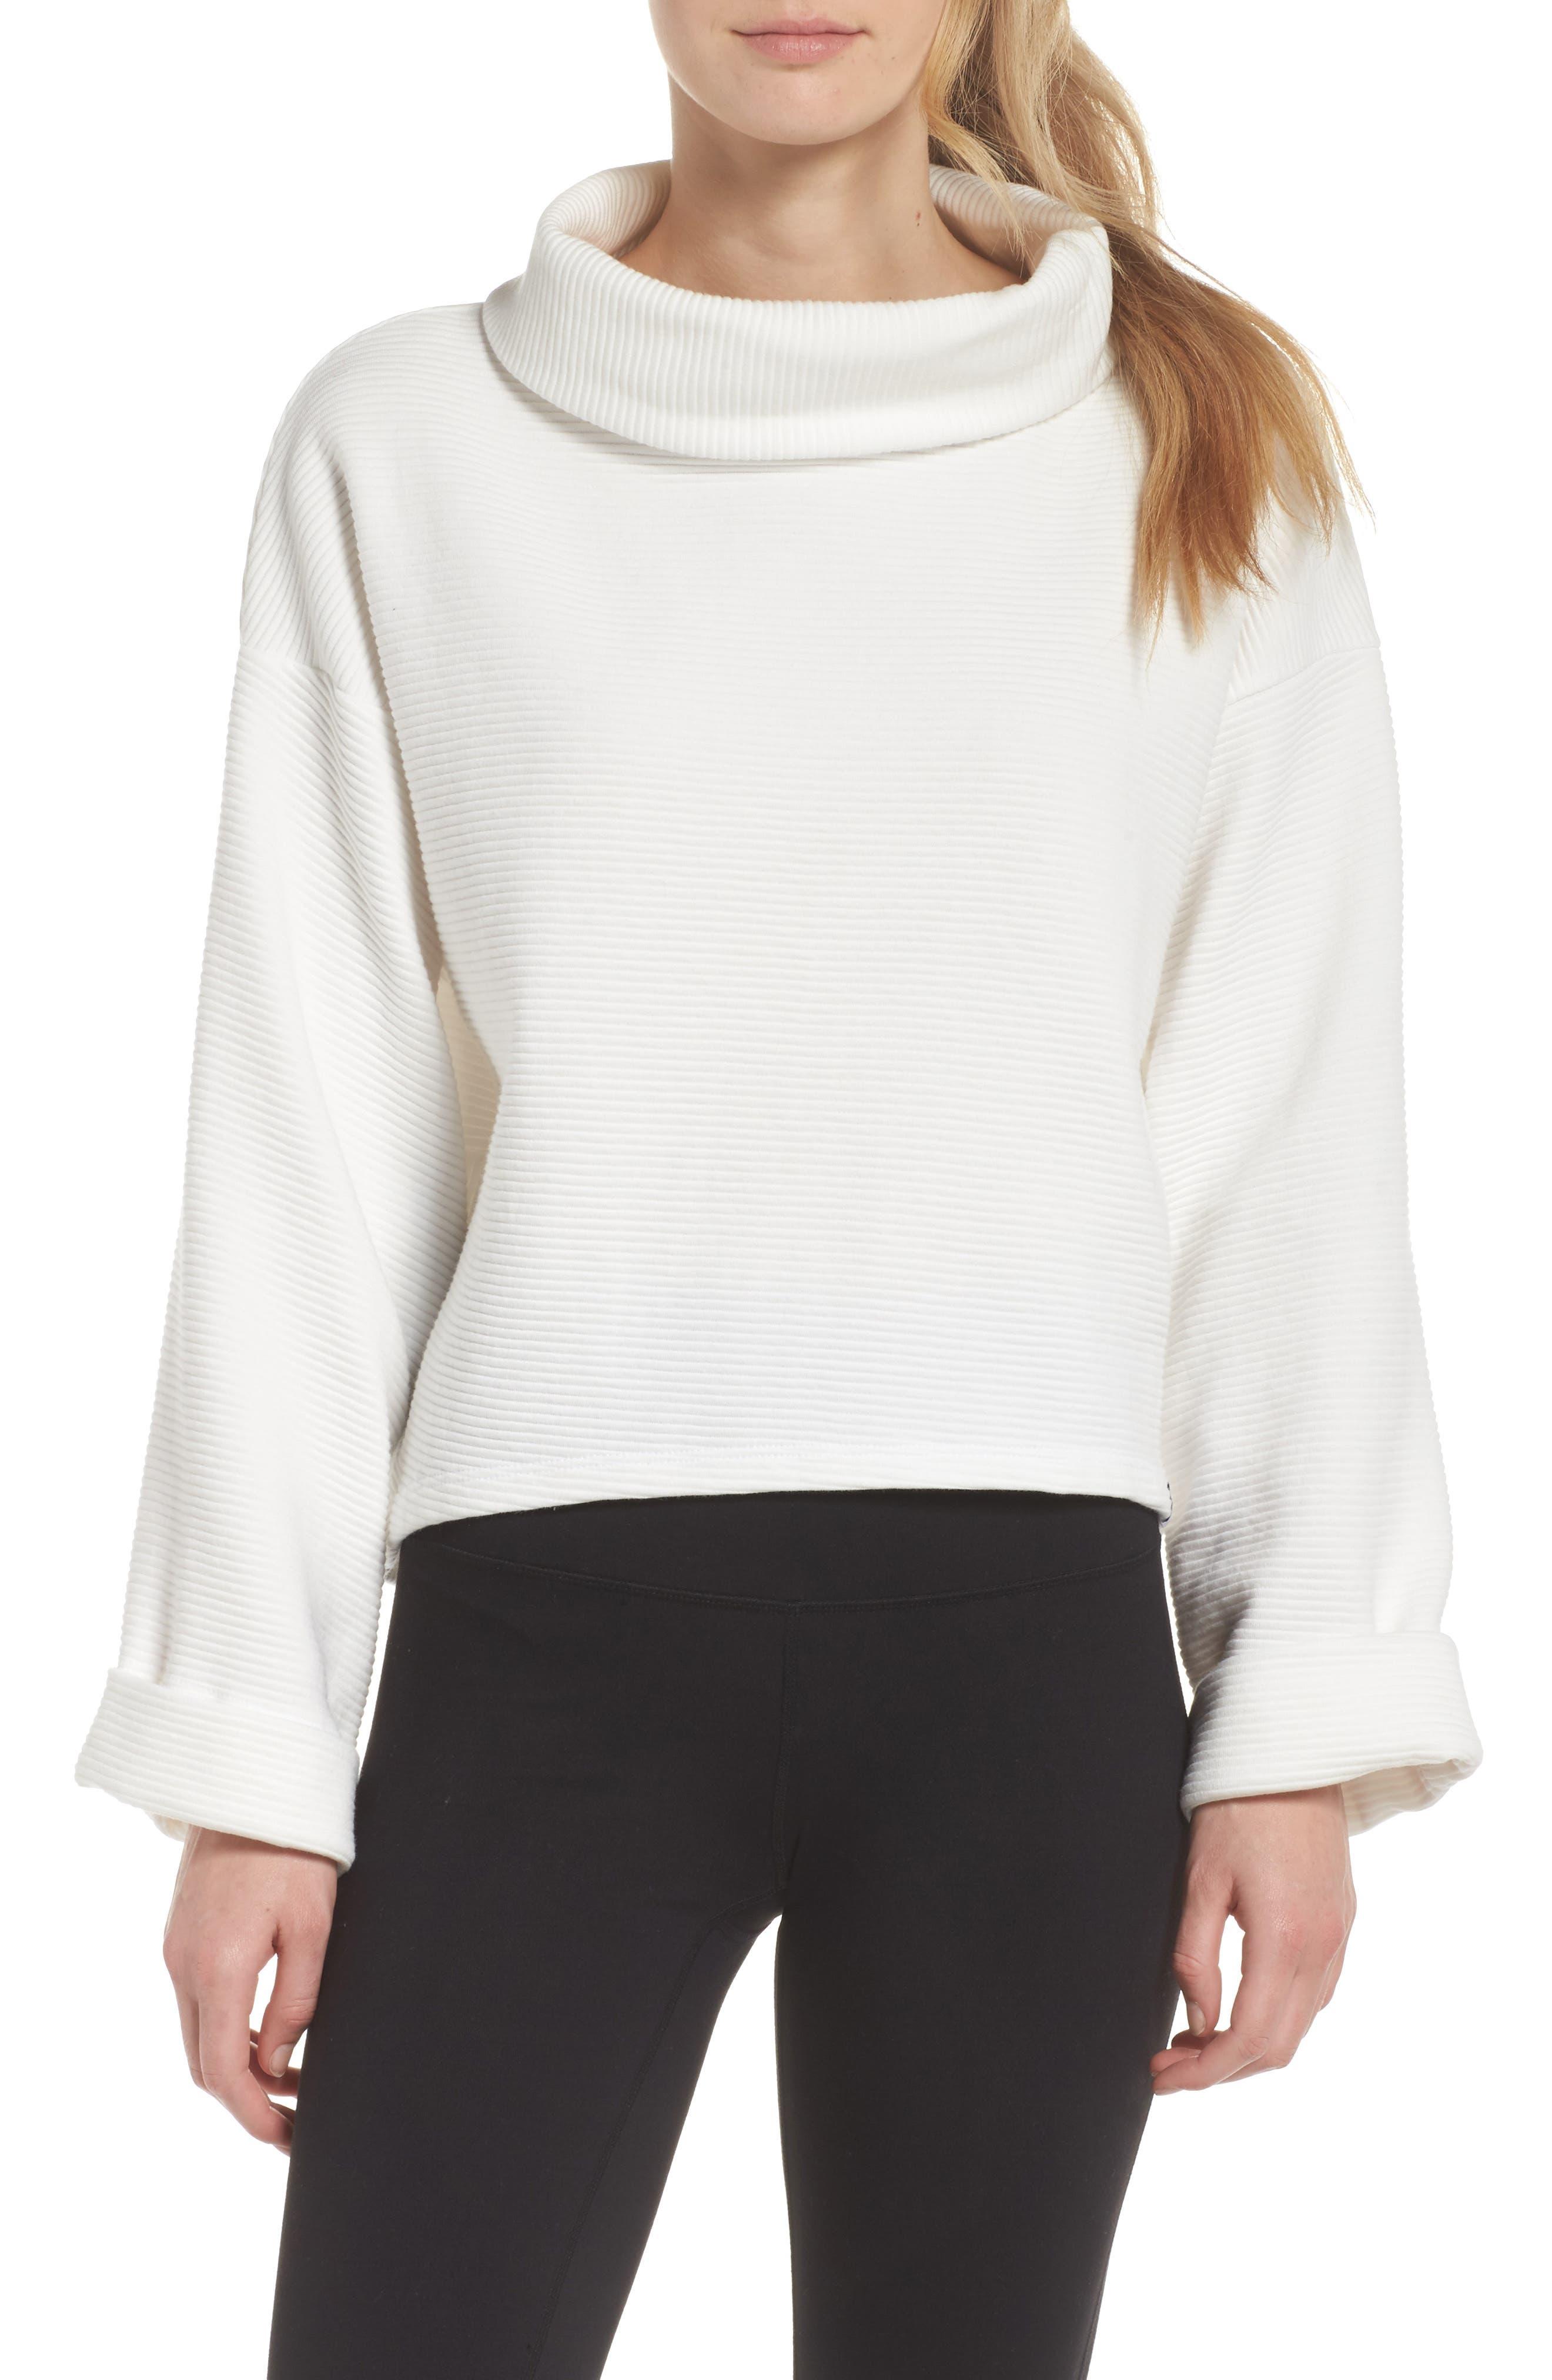 Whittier Sweatshirt,                         Main,                         color, White